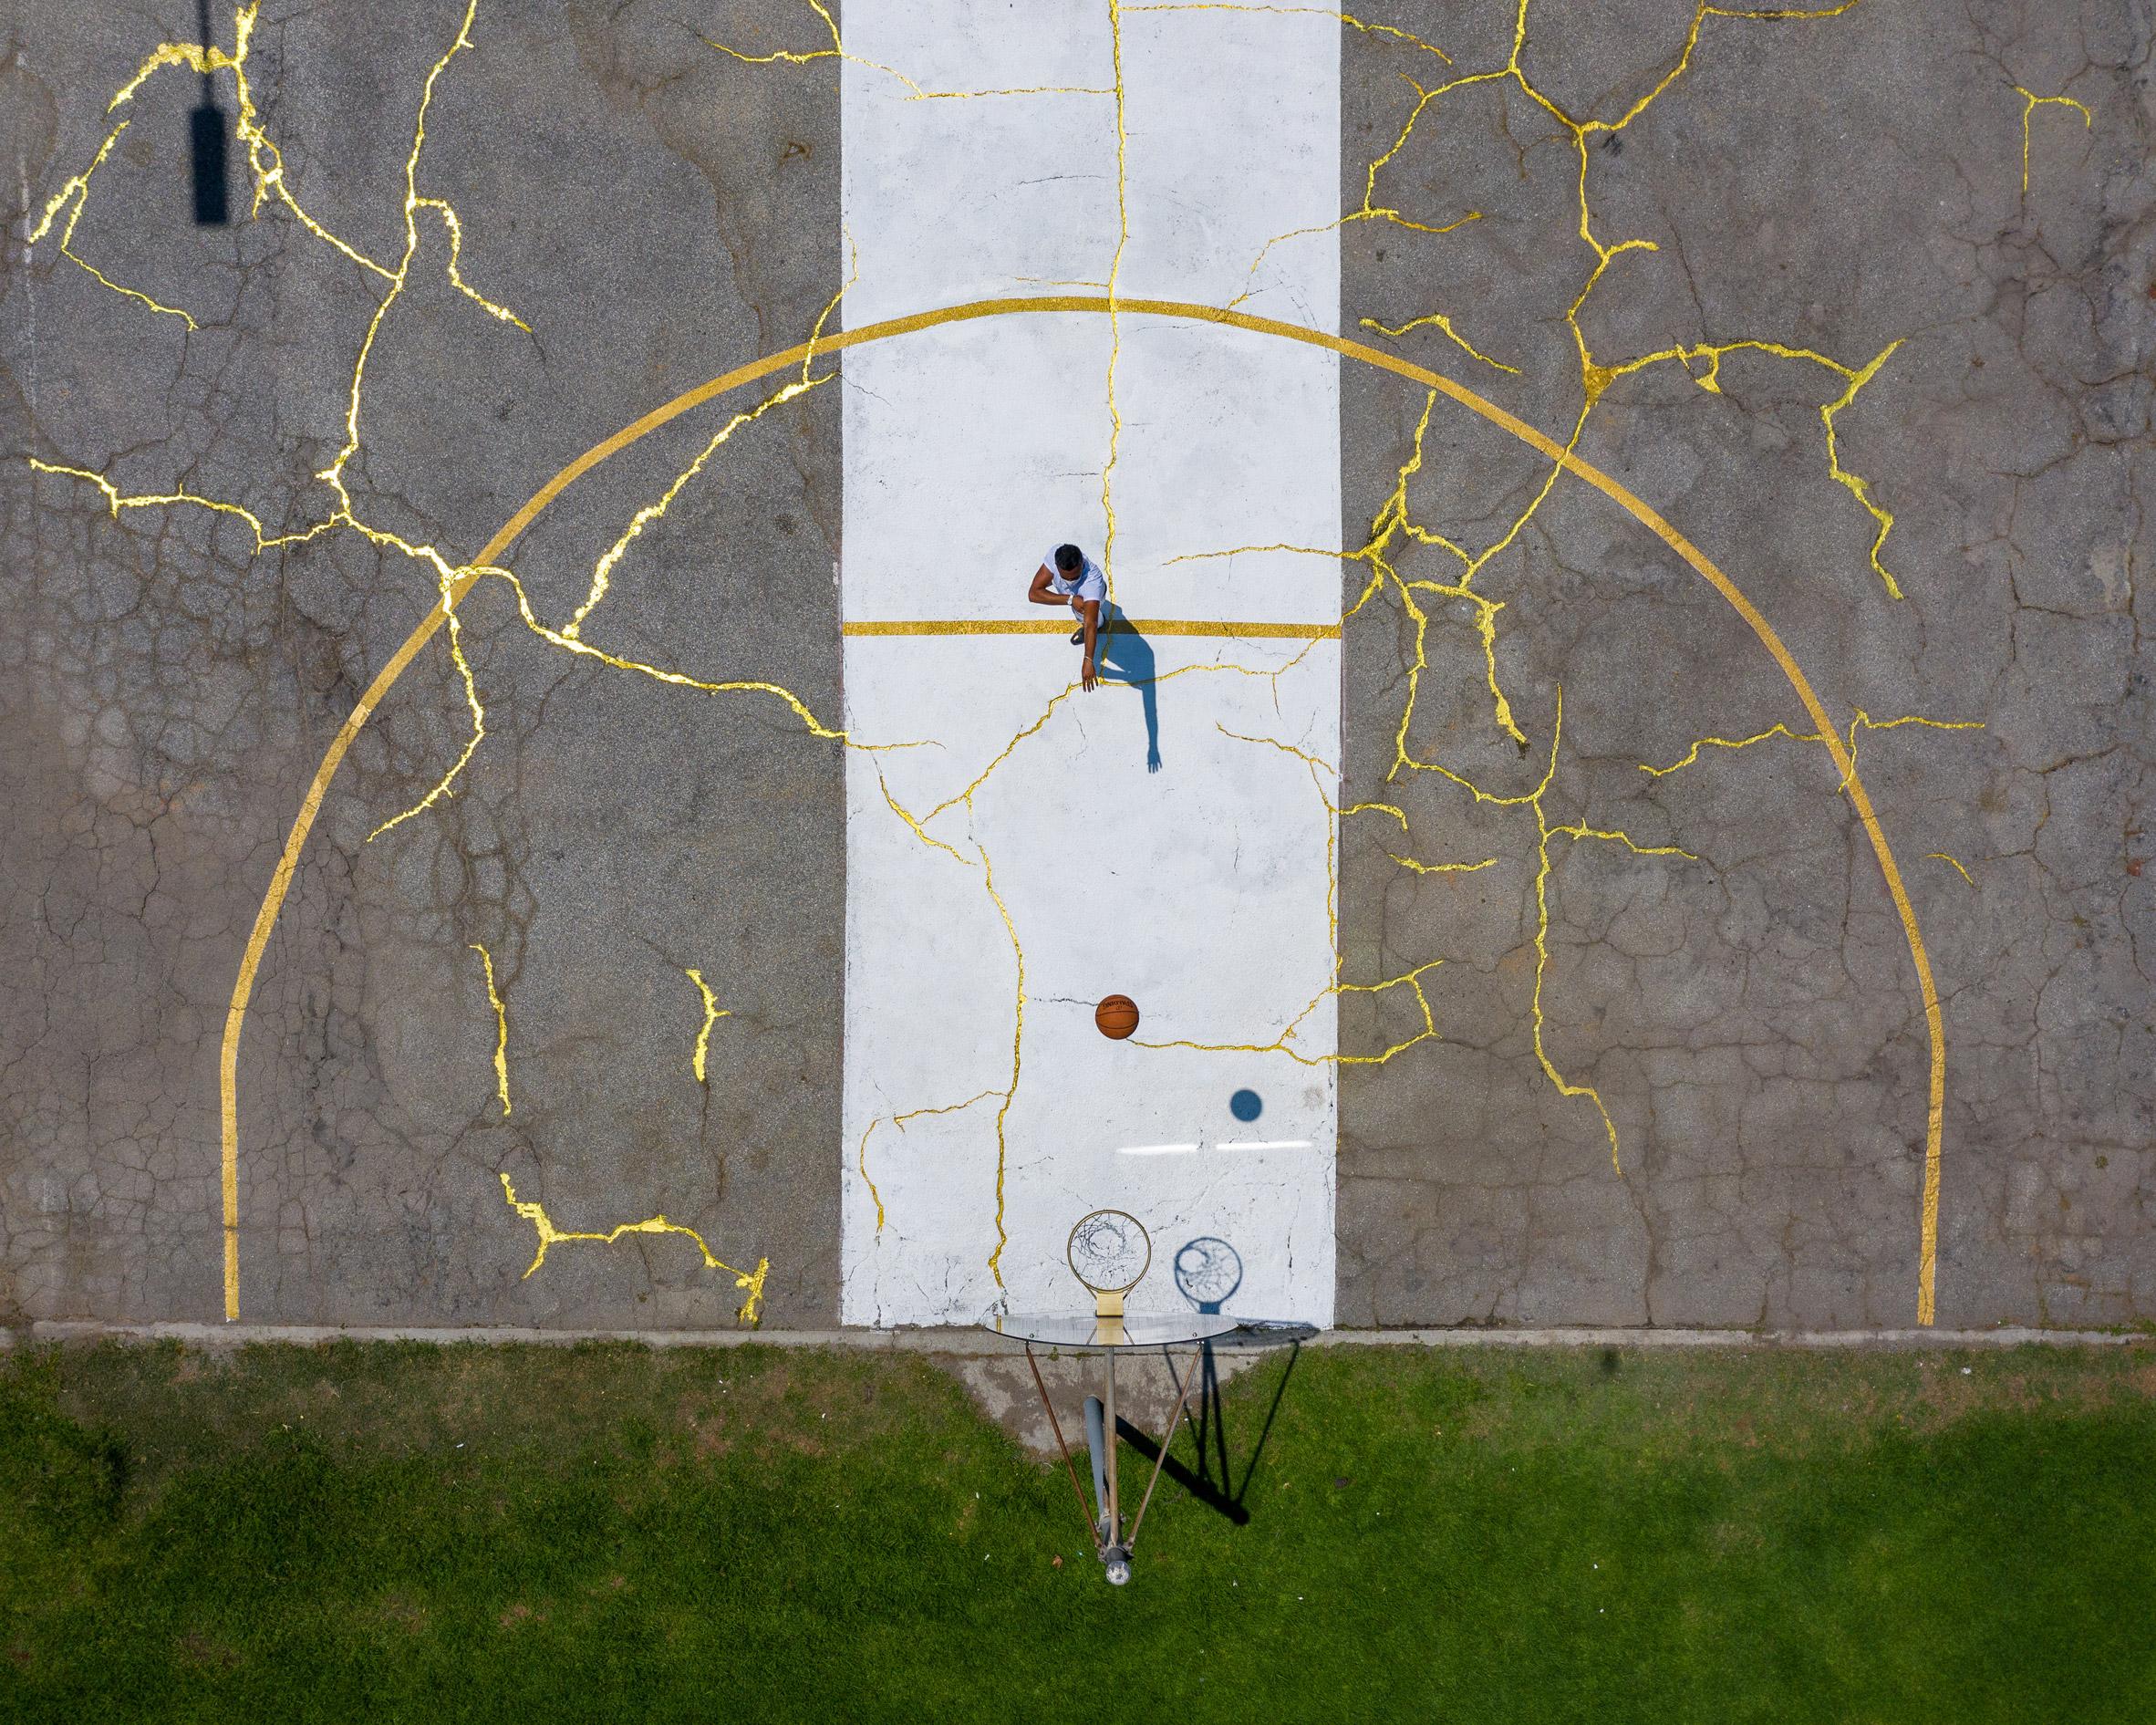 Victor Solomon mends LA basketball court using Japanese art of Kintsugi